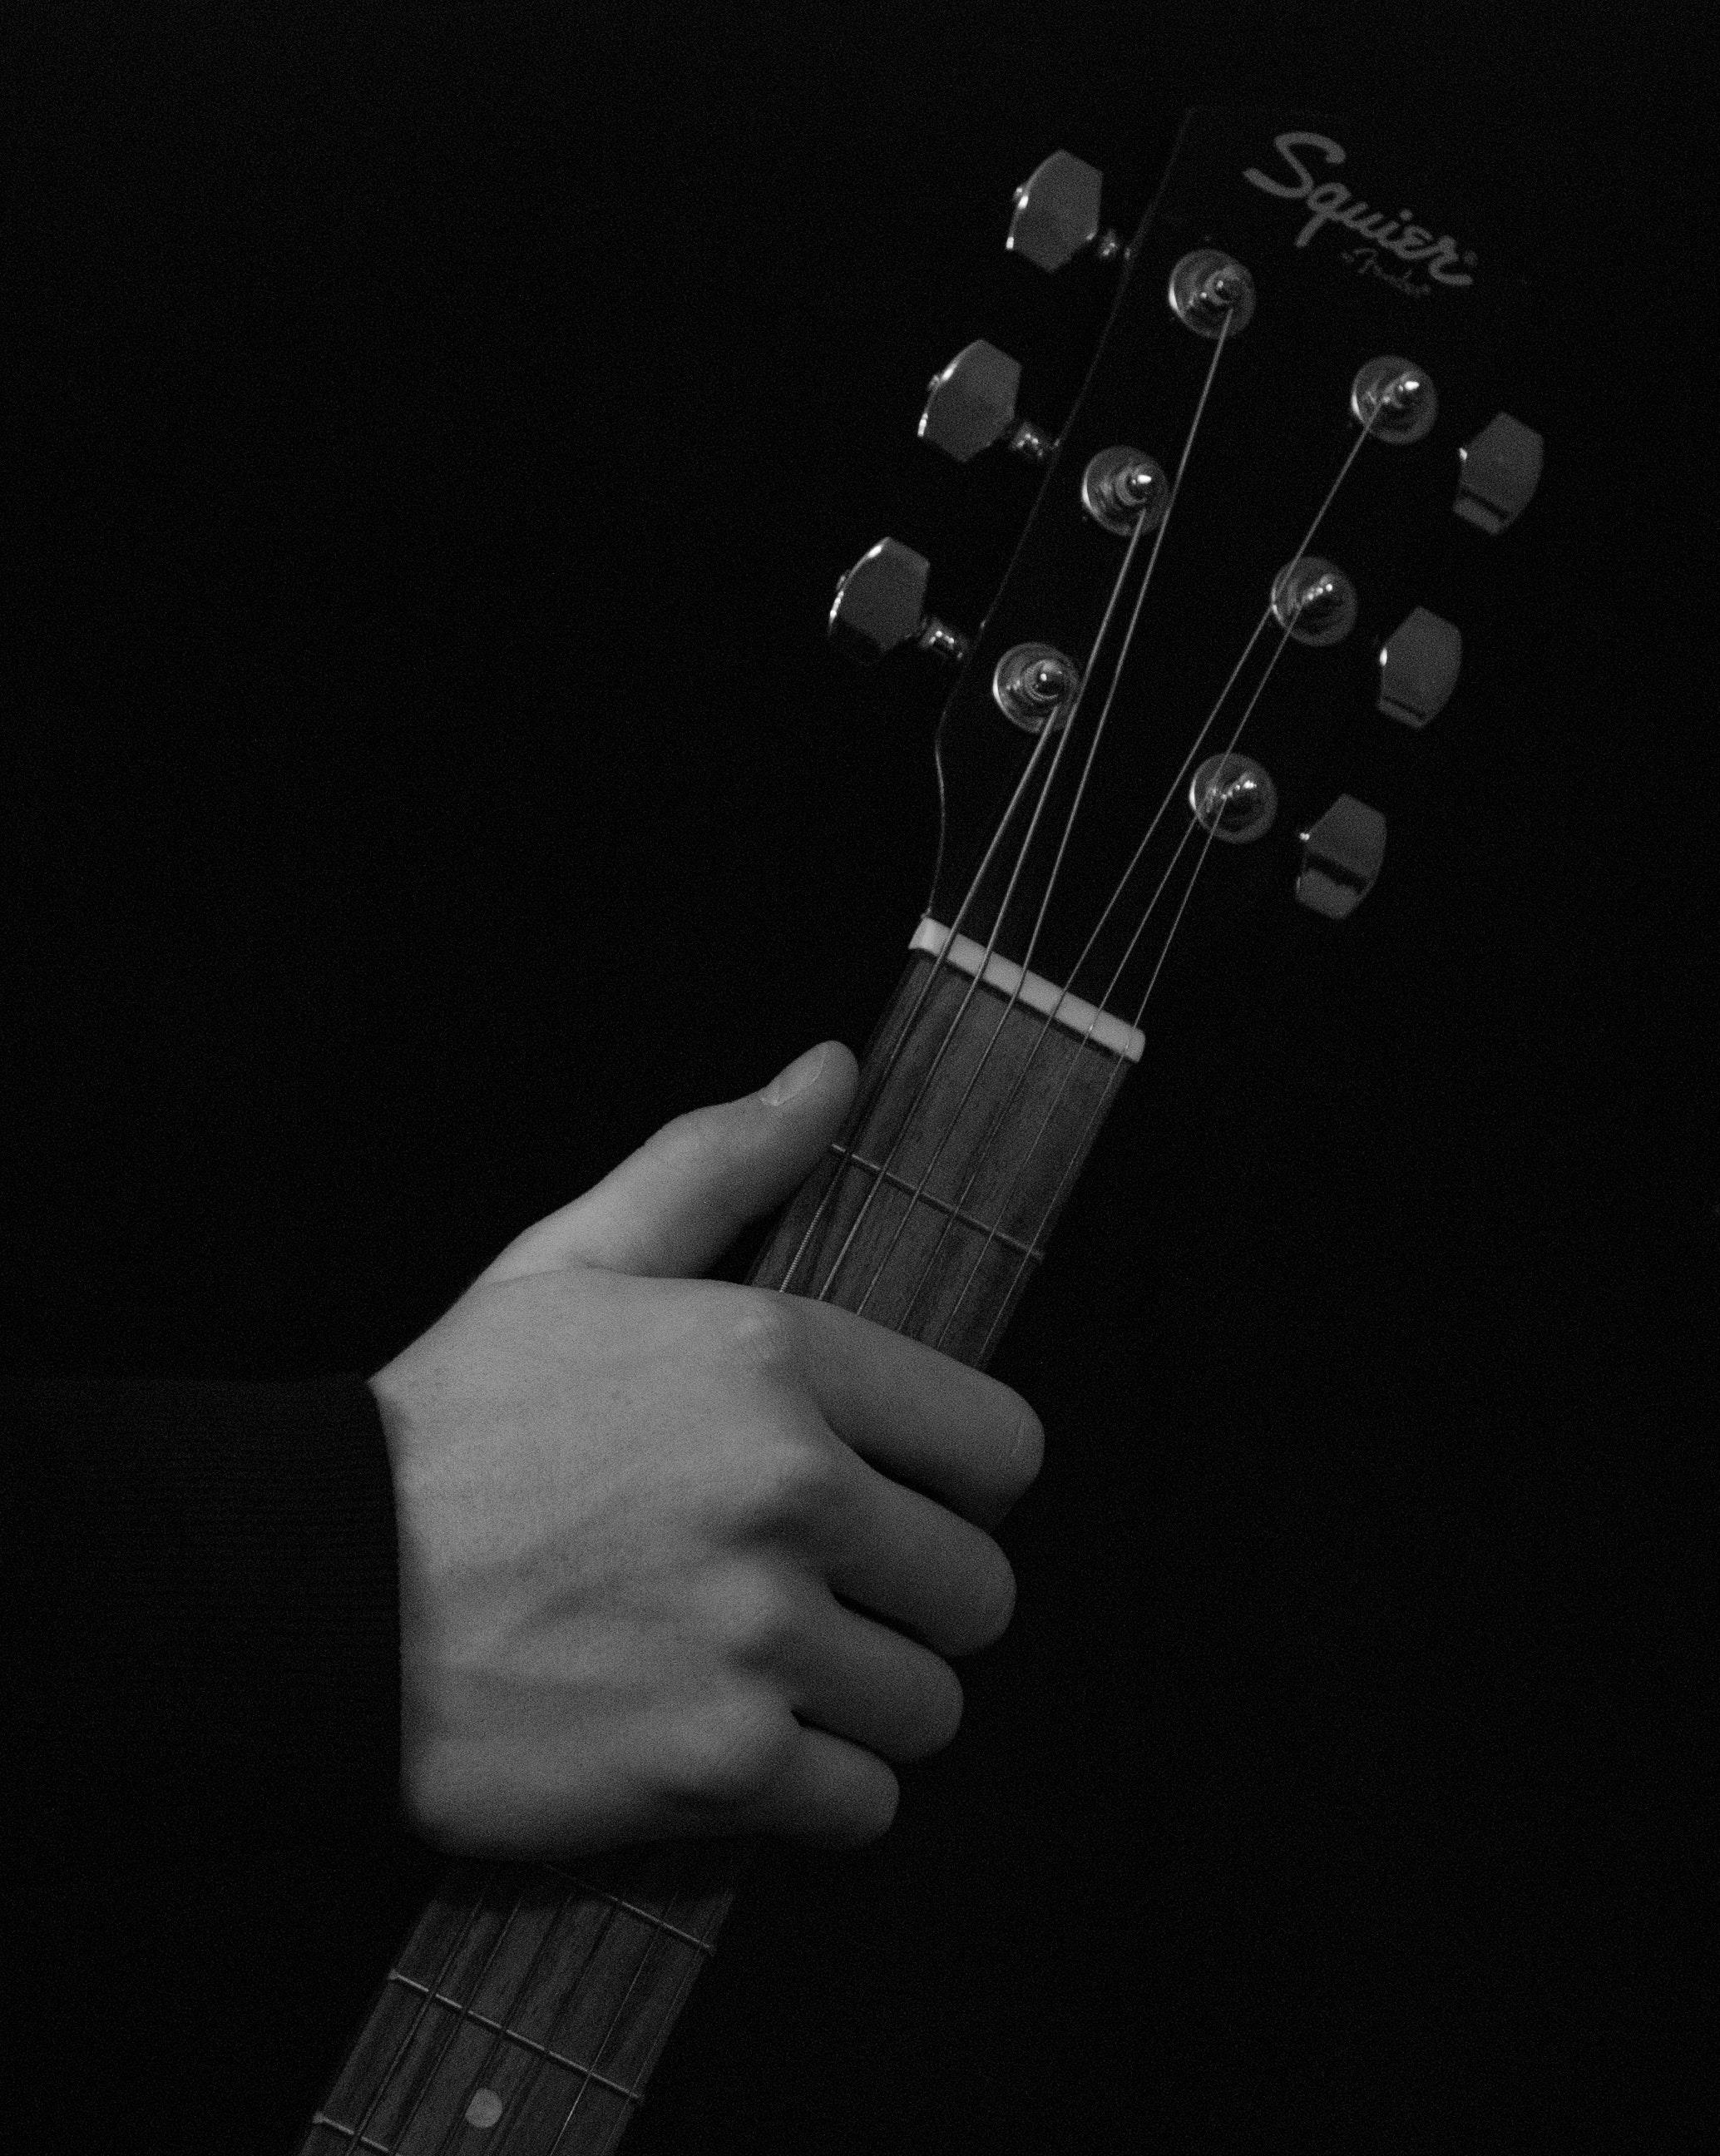 Person holding black squier fender guitar photo